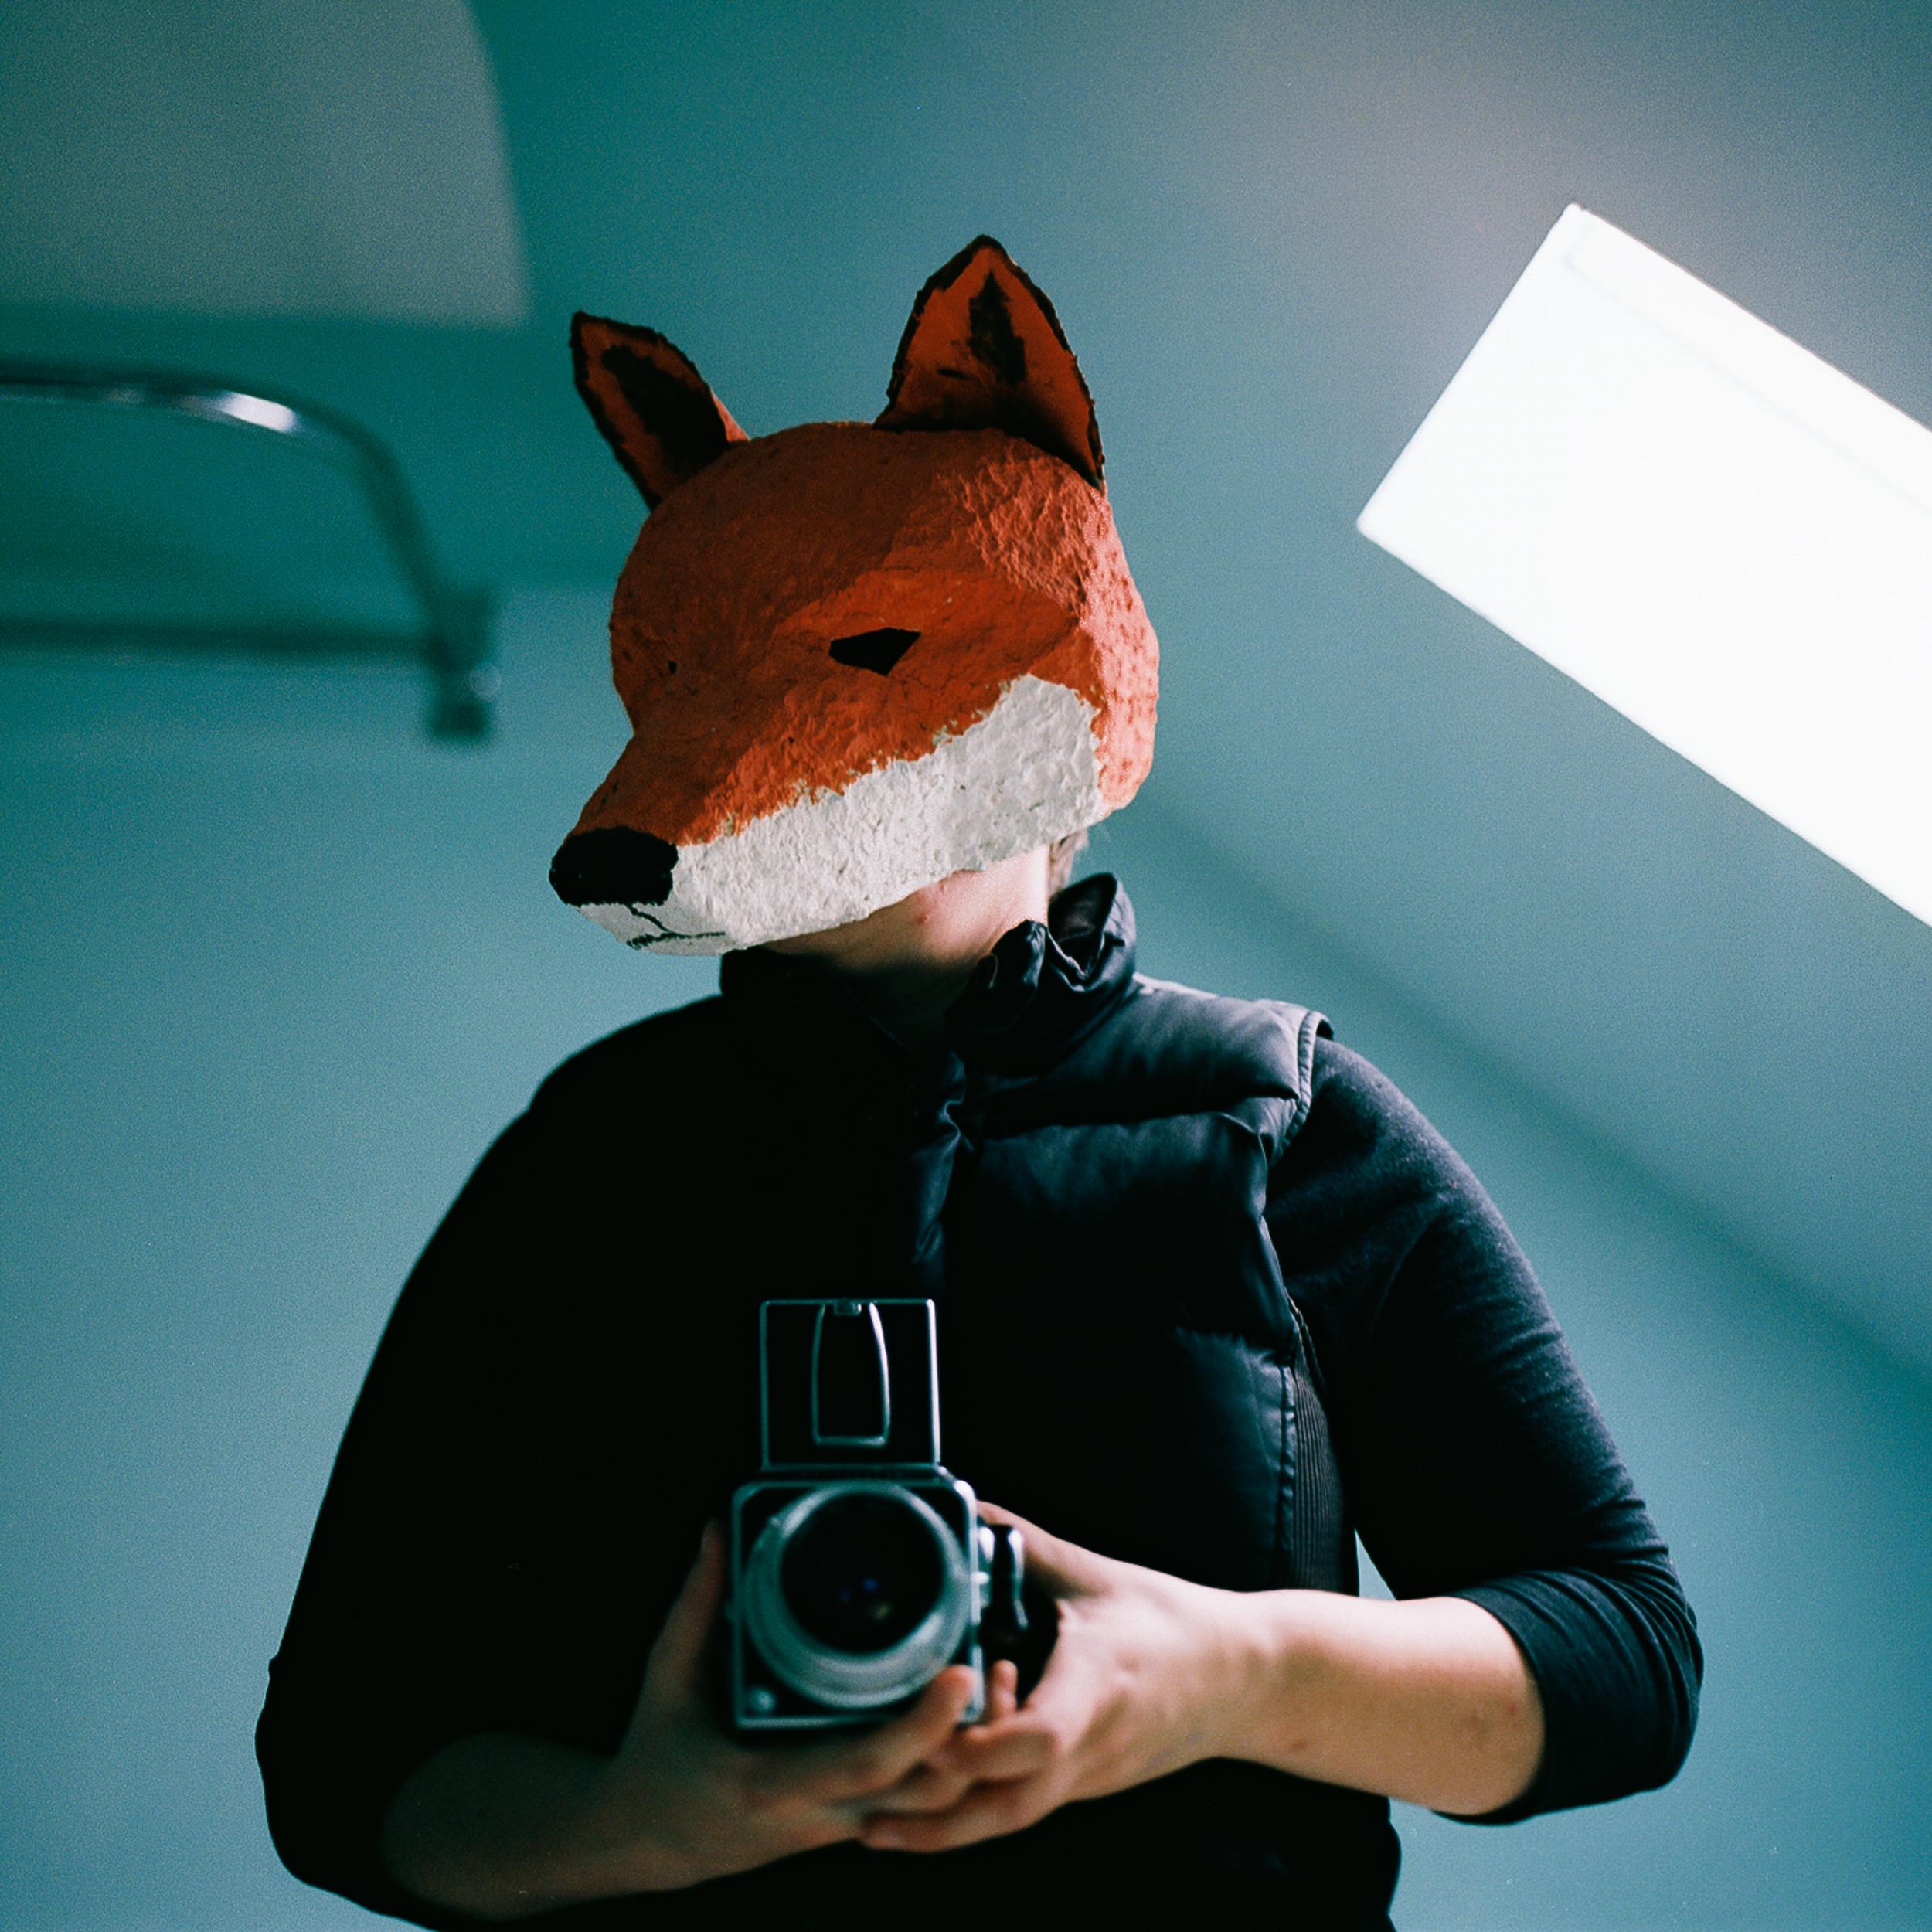 Jen Battis | Self Portraits With A Fox Mask | Hasselblad 500c 80mm